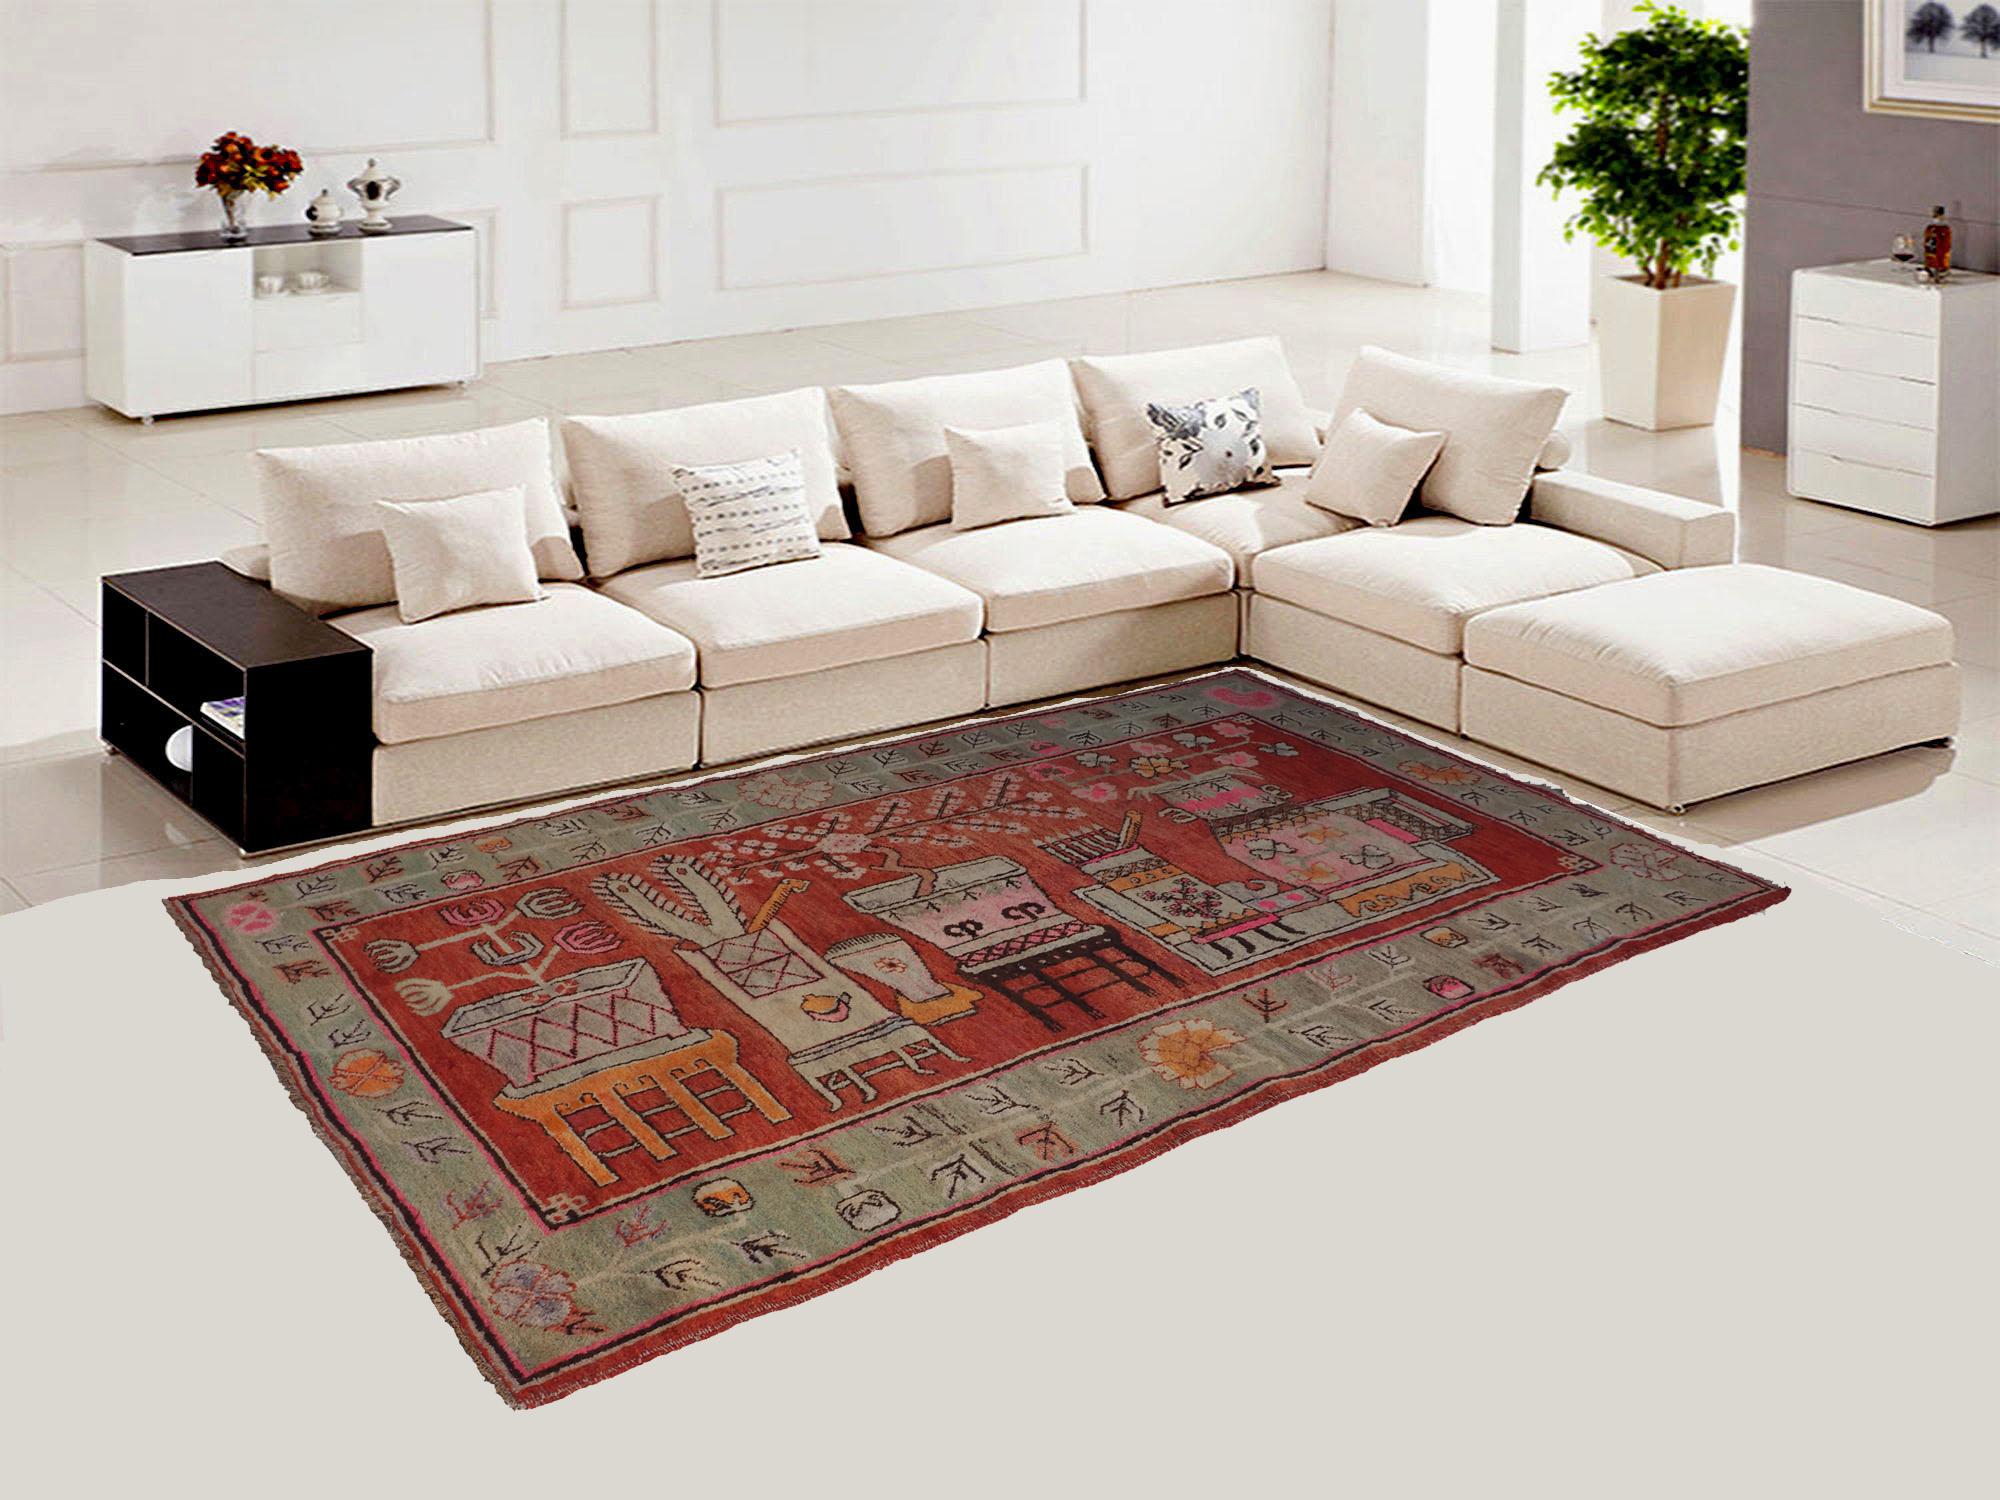 Bukhara 252x146 cm original antique Khotan Samarkand rug Chinese Turkestan hand knotted carpet No:21/41